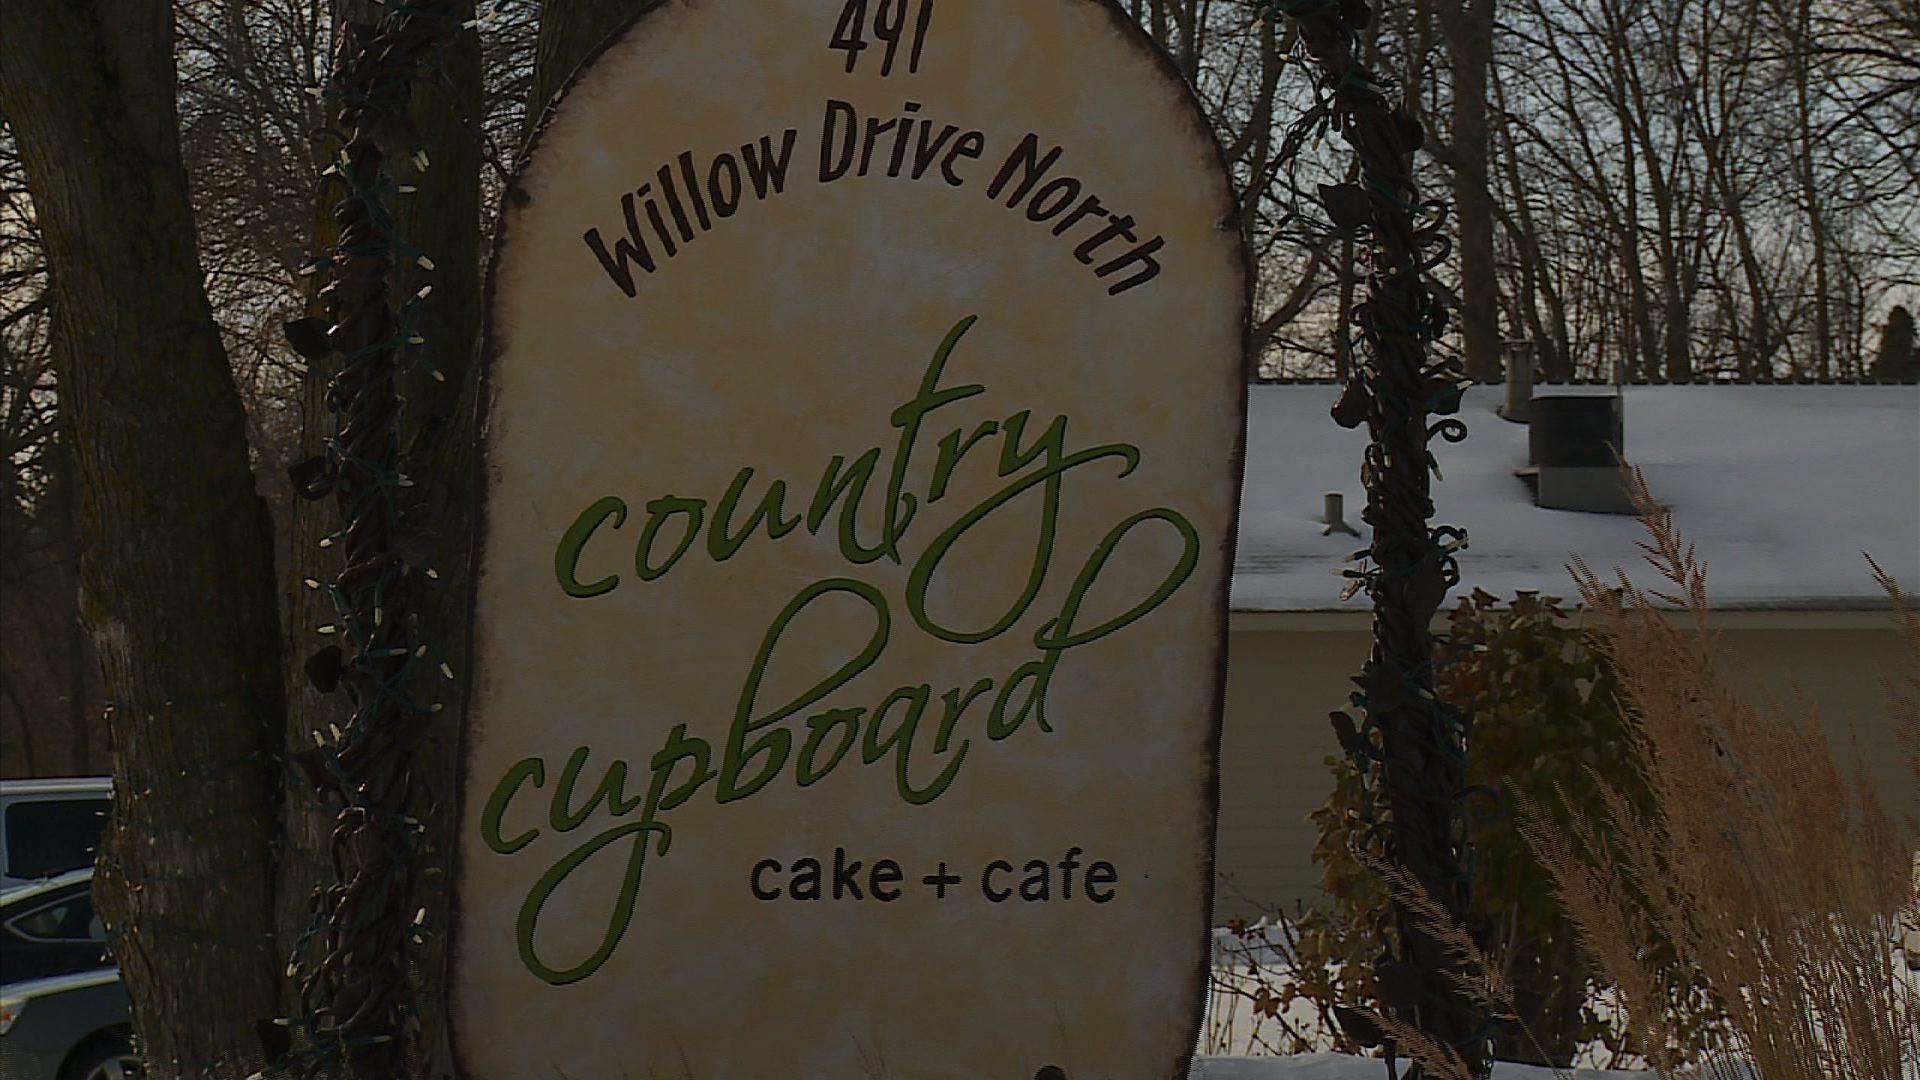 Derusha Eats Country Cake Cupboard Cafe And Bakery Bakery Cake Cafe Cafe